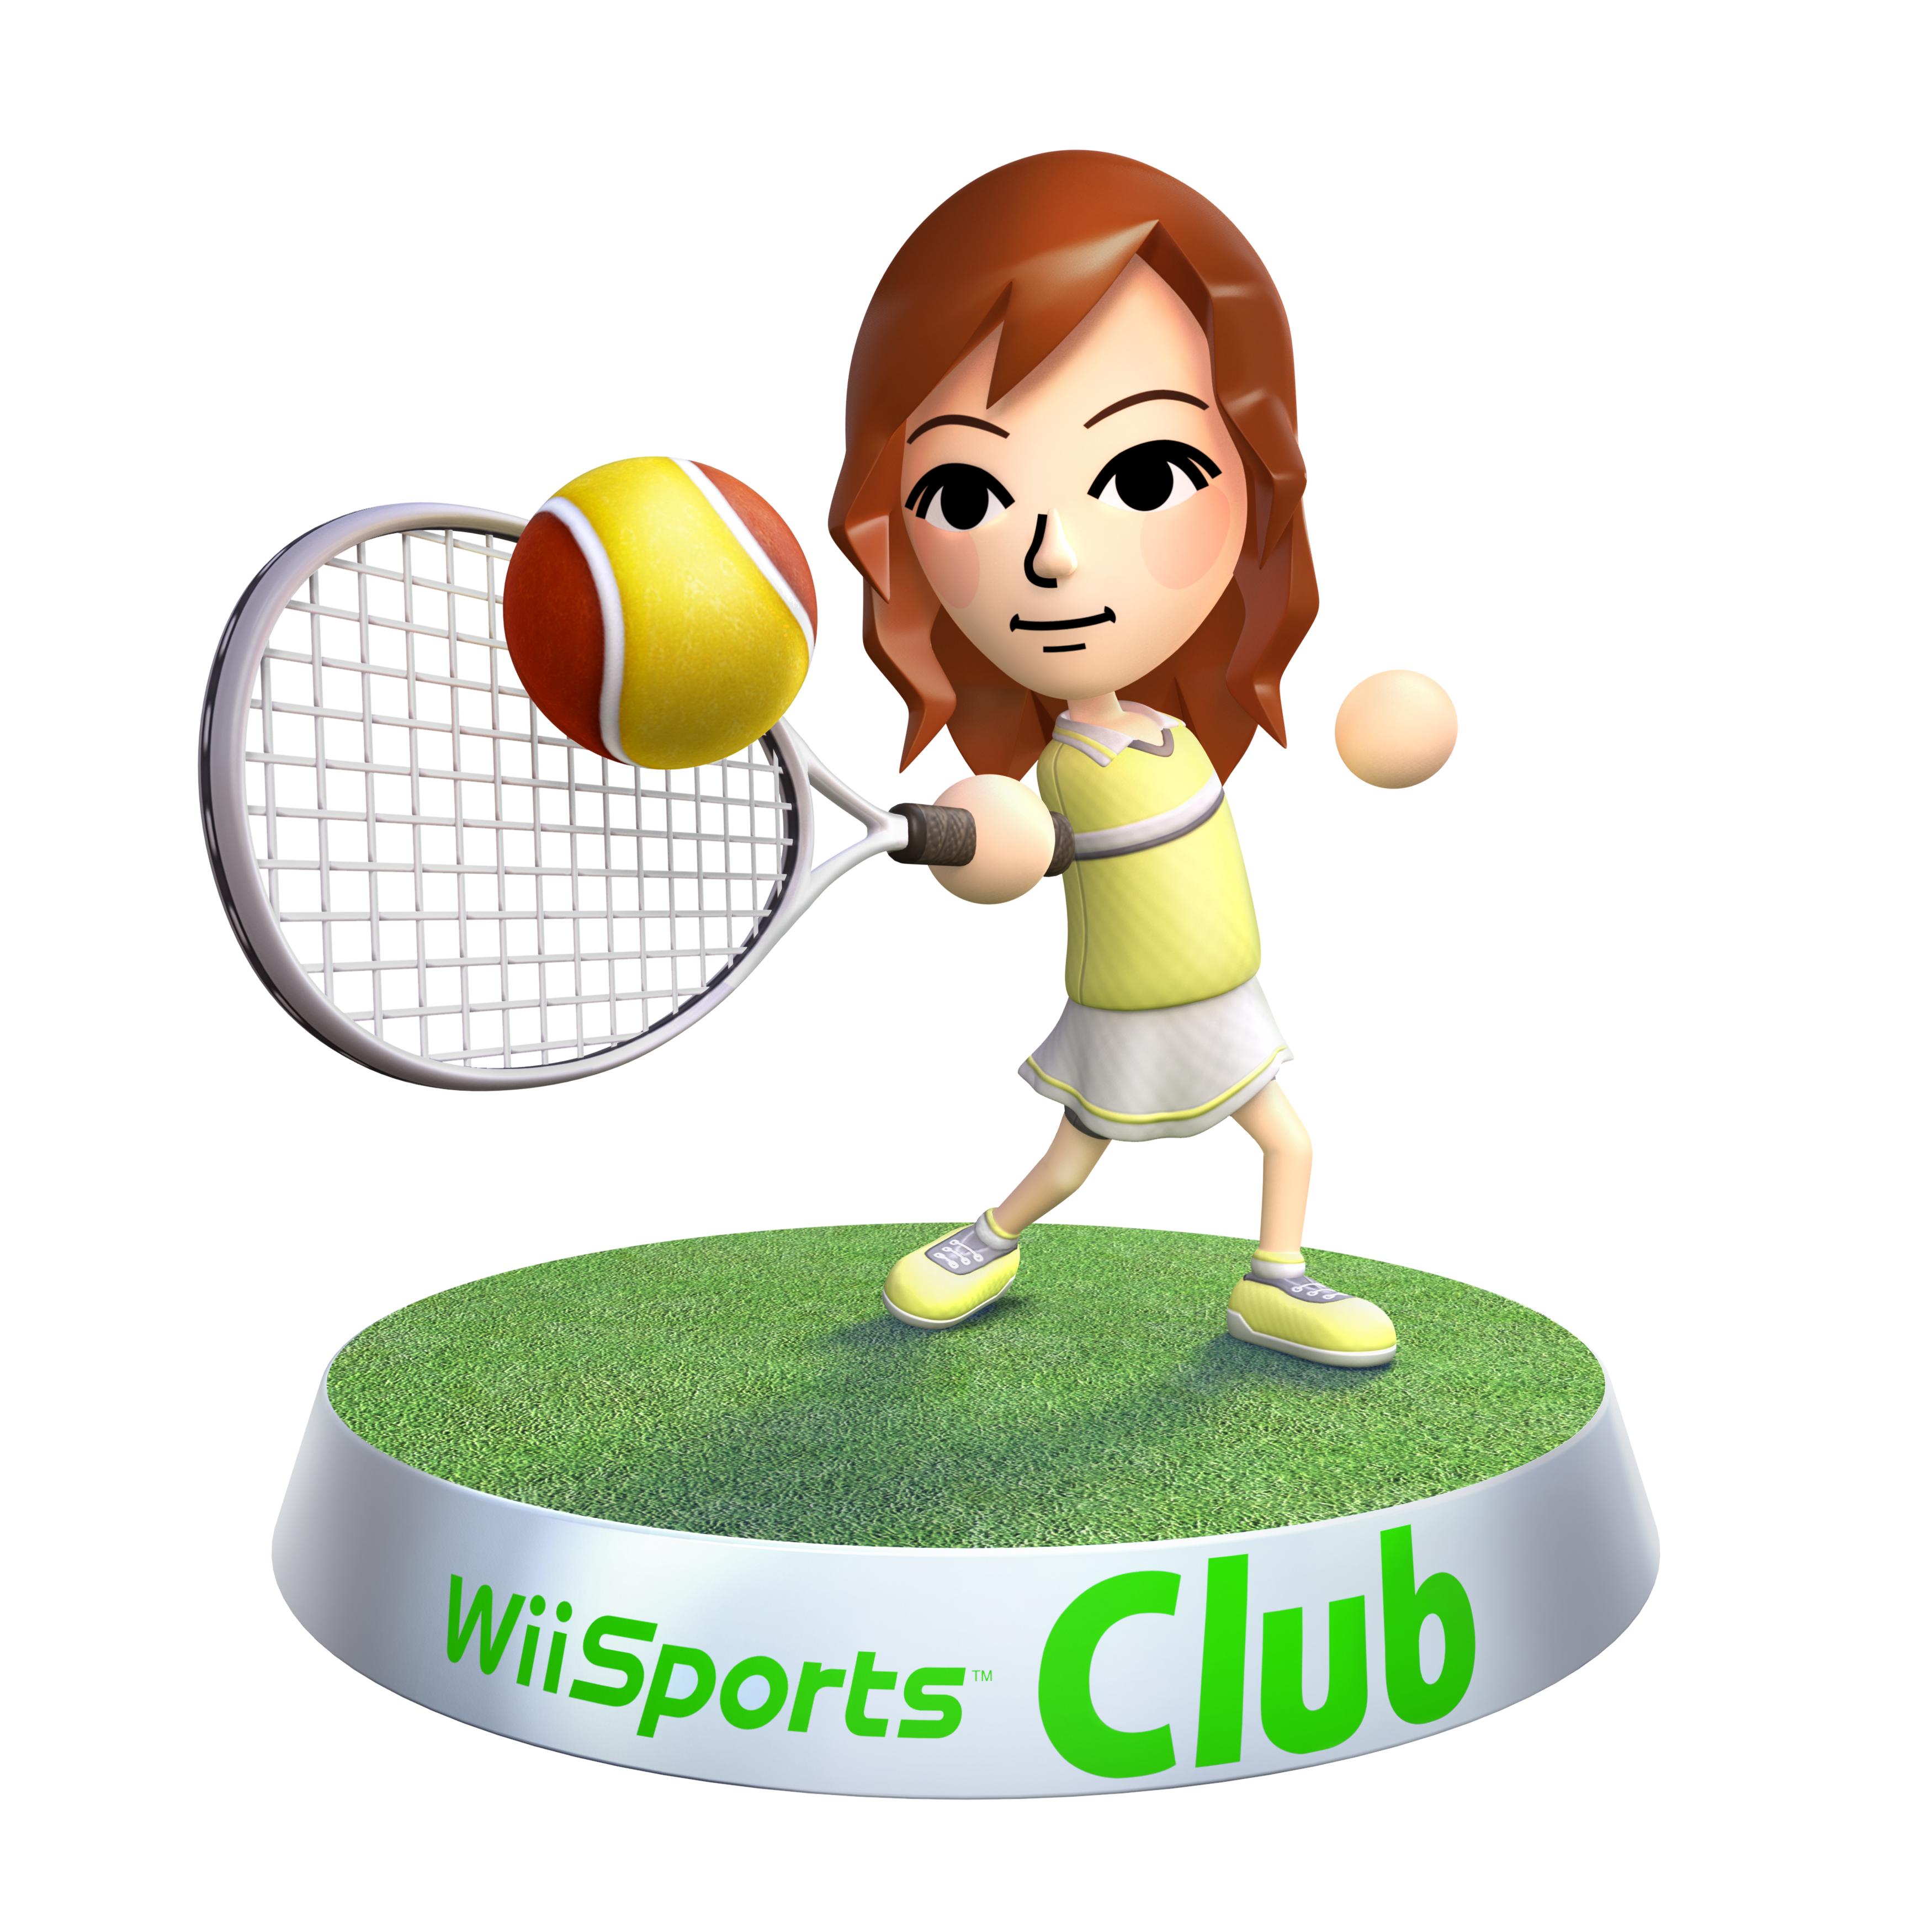 Bowling clipart wii bowling. Nintendo news sports club